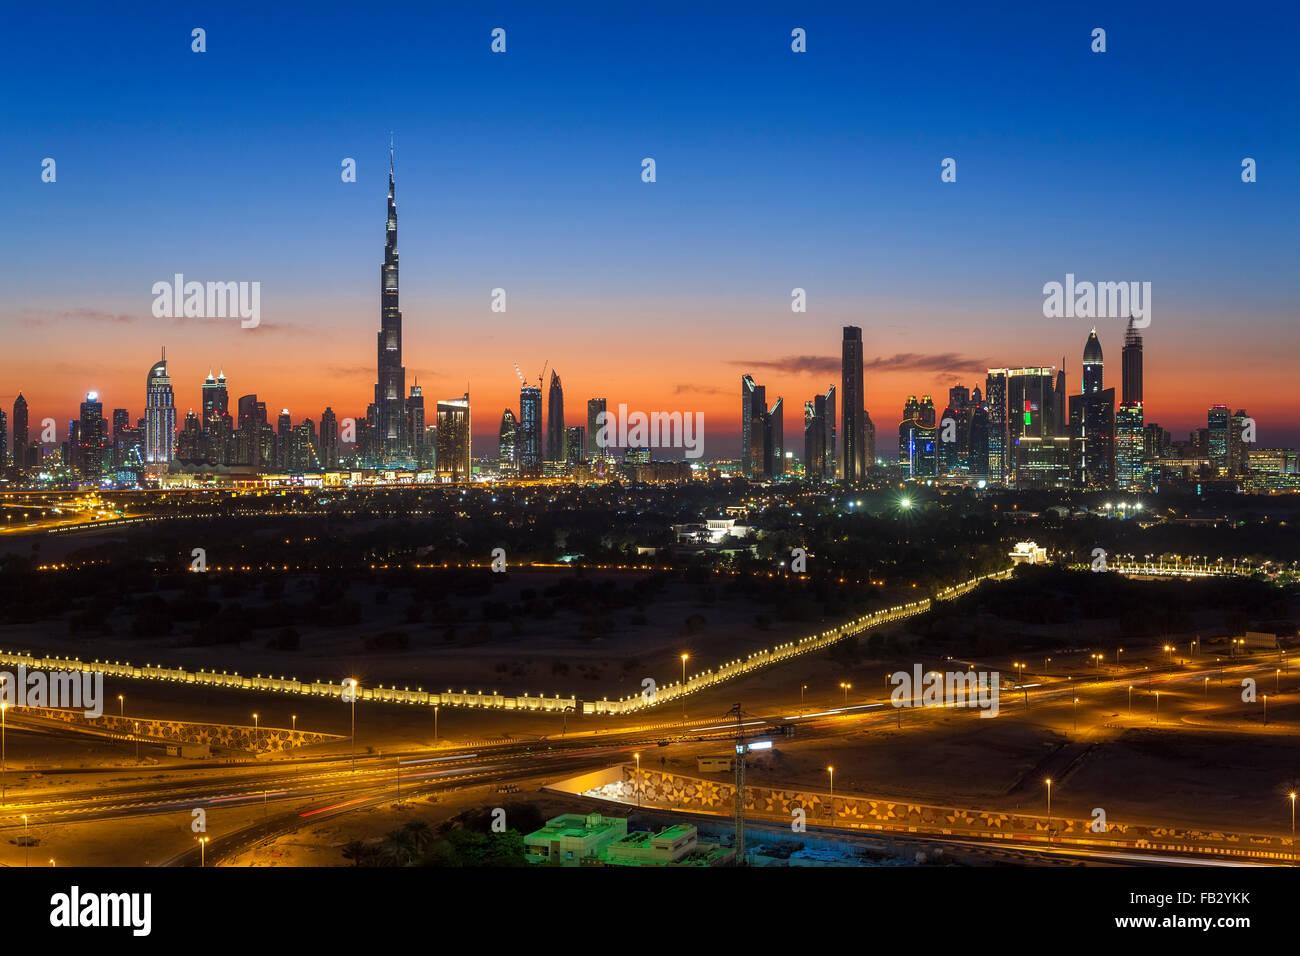 Los Emiratos Árabes Unidos, Dubai, vista elevada del nuevo horizonte de Dubai, el Burj Khalifa, moderna arquitectura Foto de stock